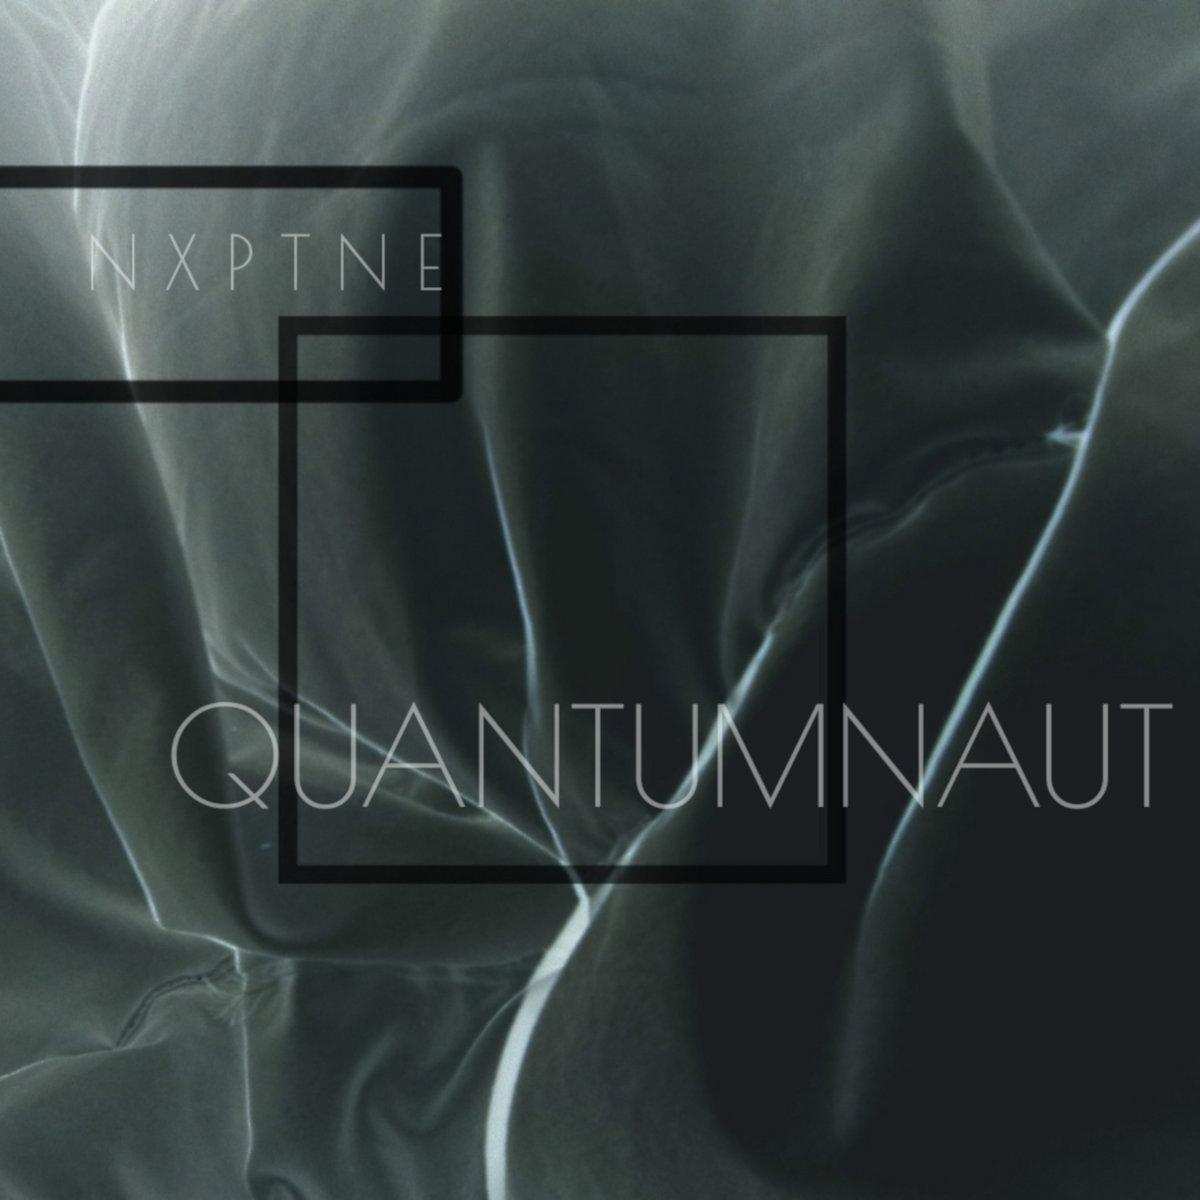 STREAM- N X P T N E - MO7: Quantumnaut